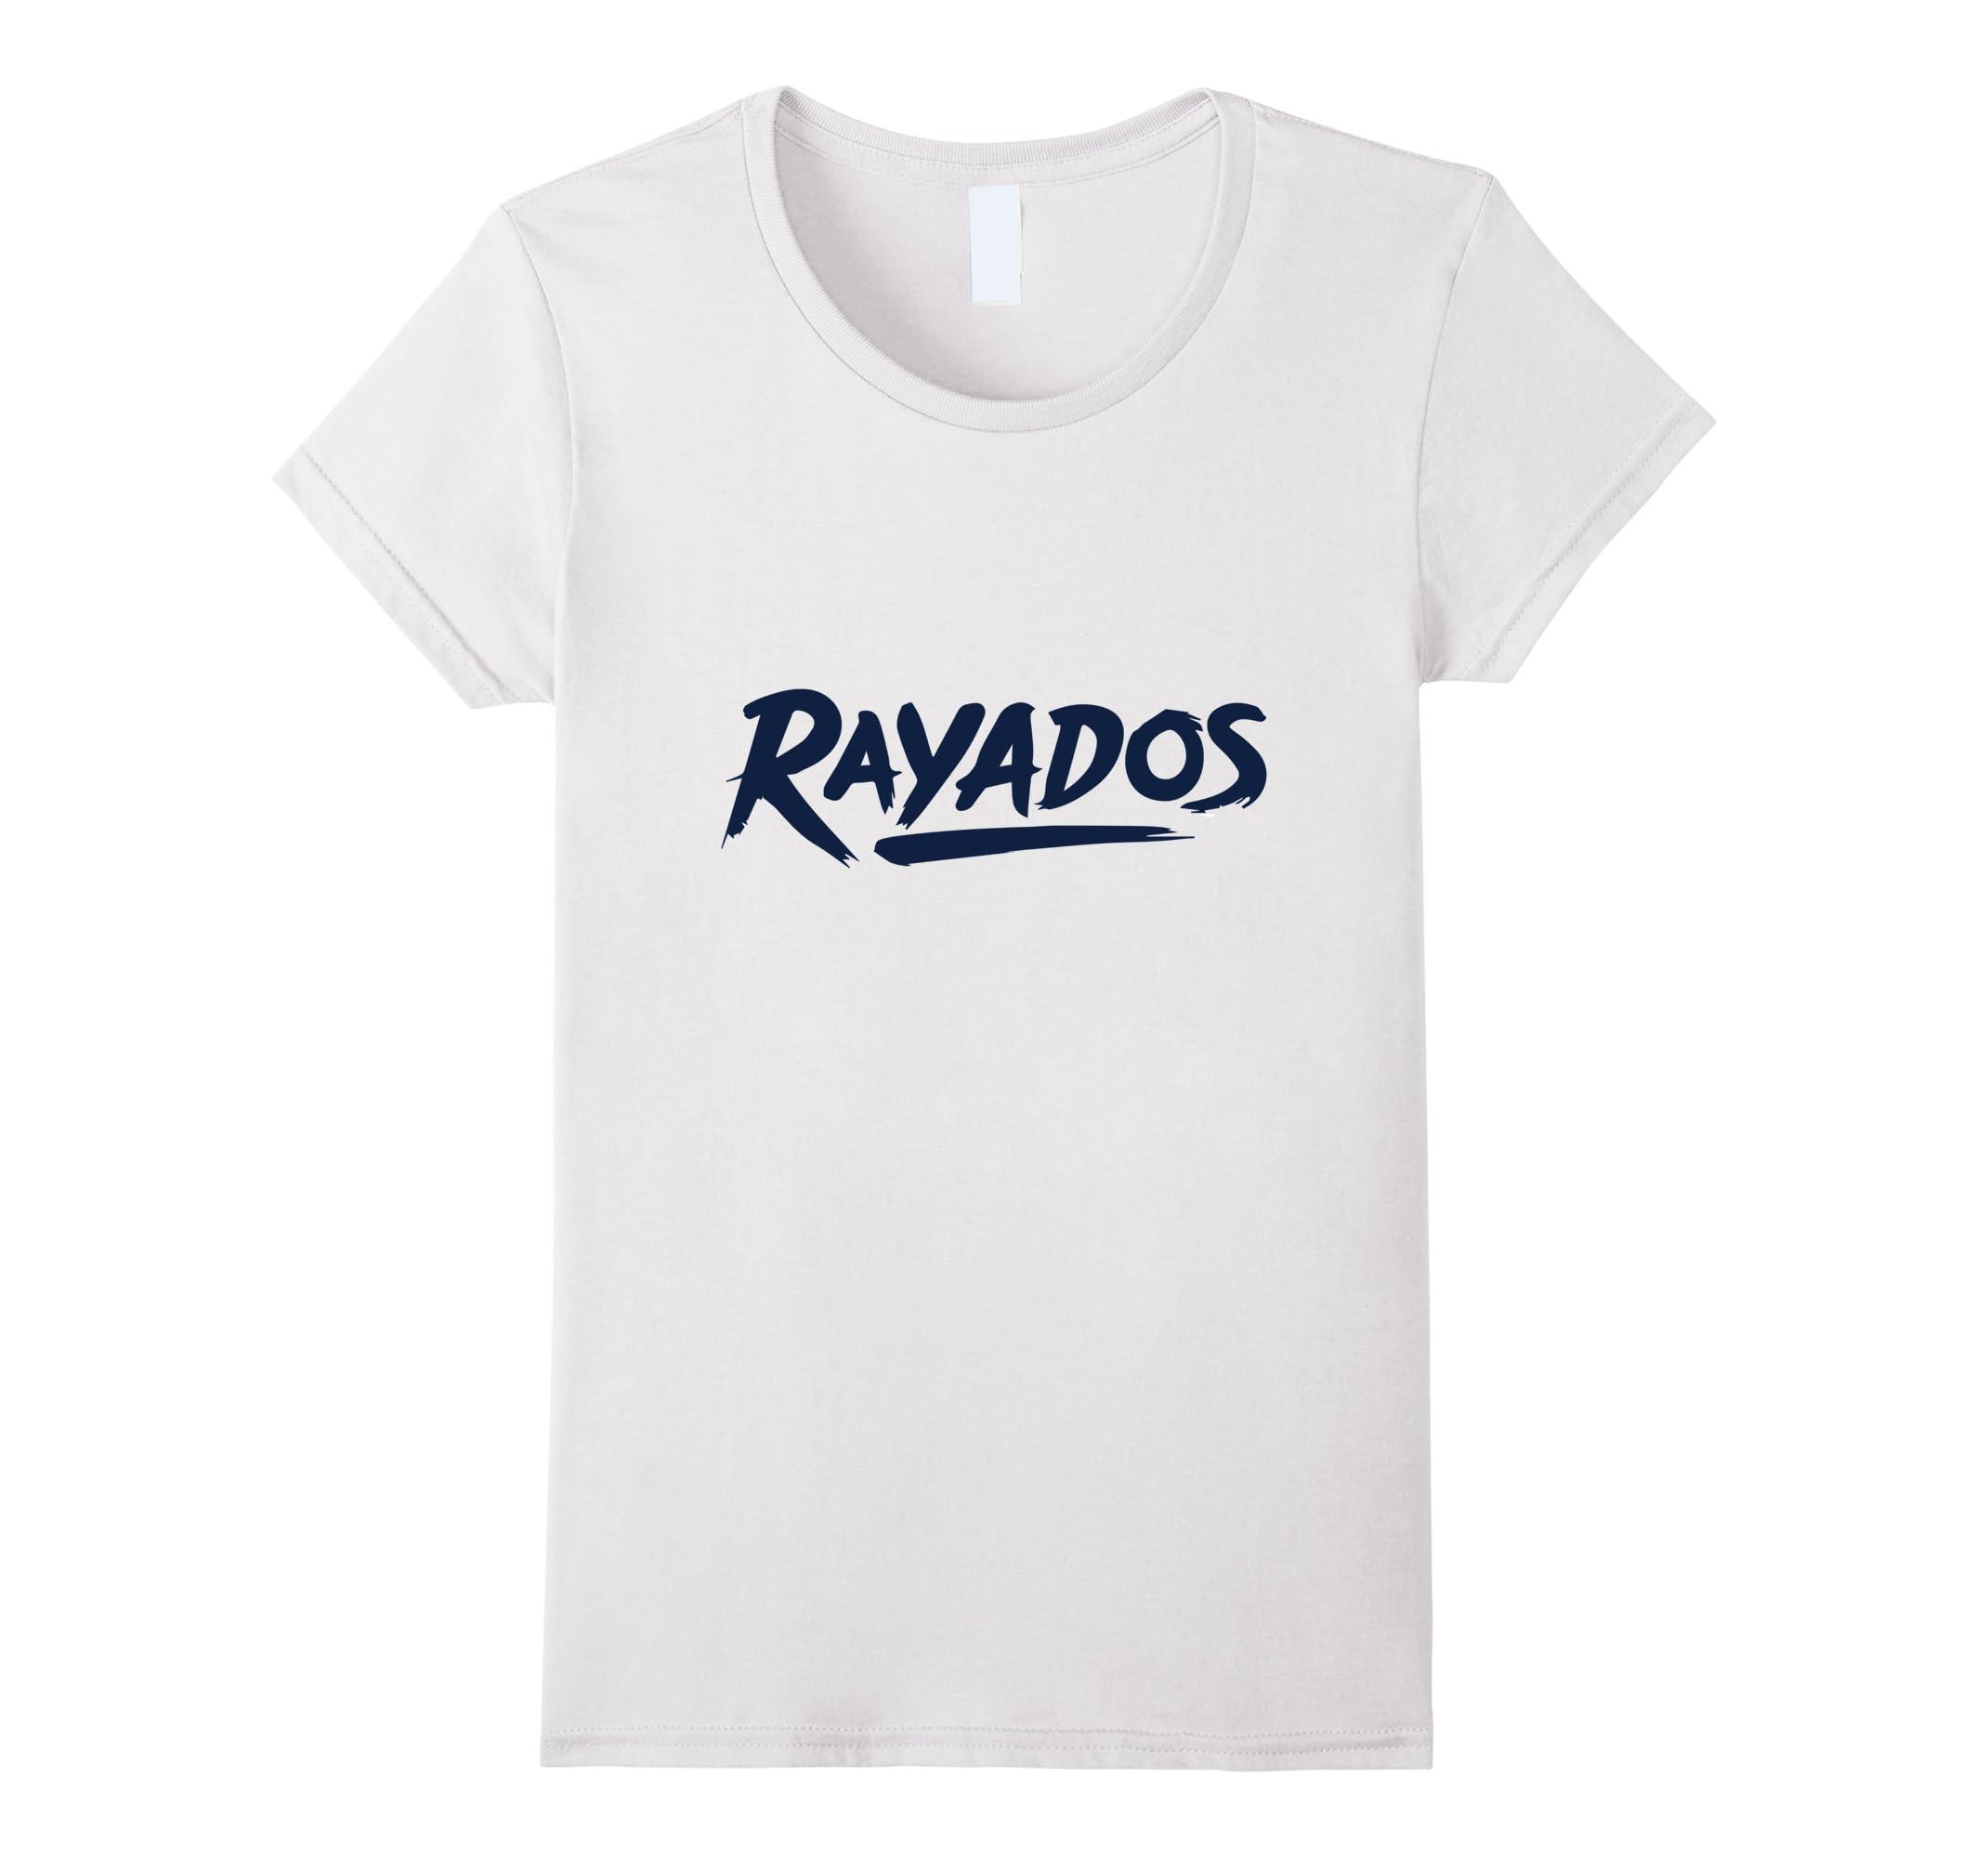 c157813251fb8 Amazon.com  Rayados de MTY Equipo Camisa T Shirt Playera Futbol Jersey   Clothing